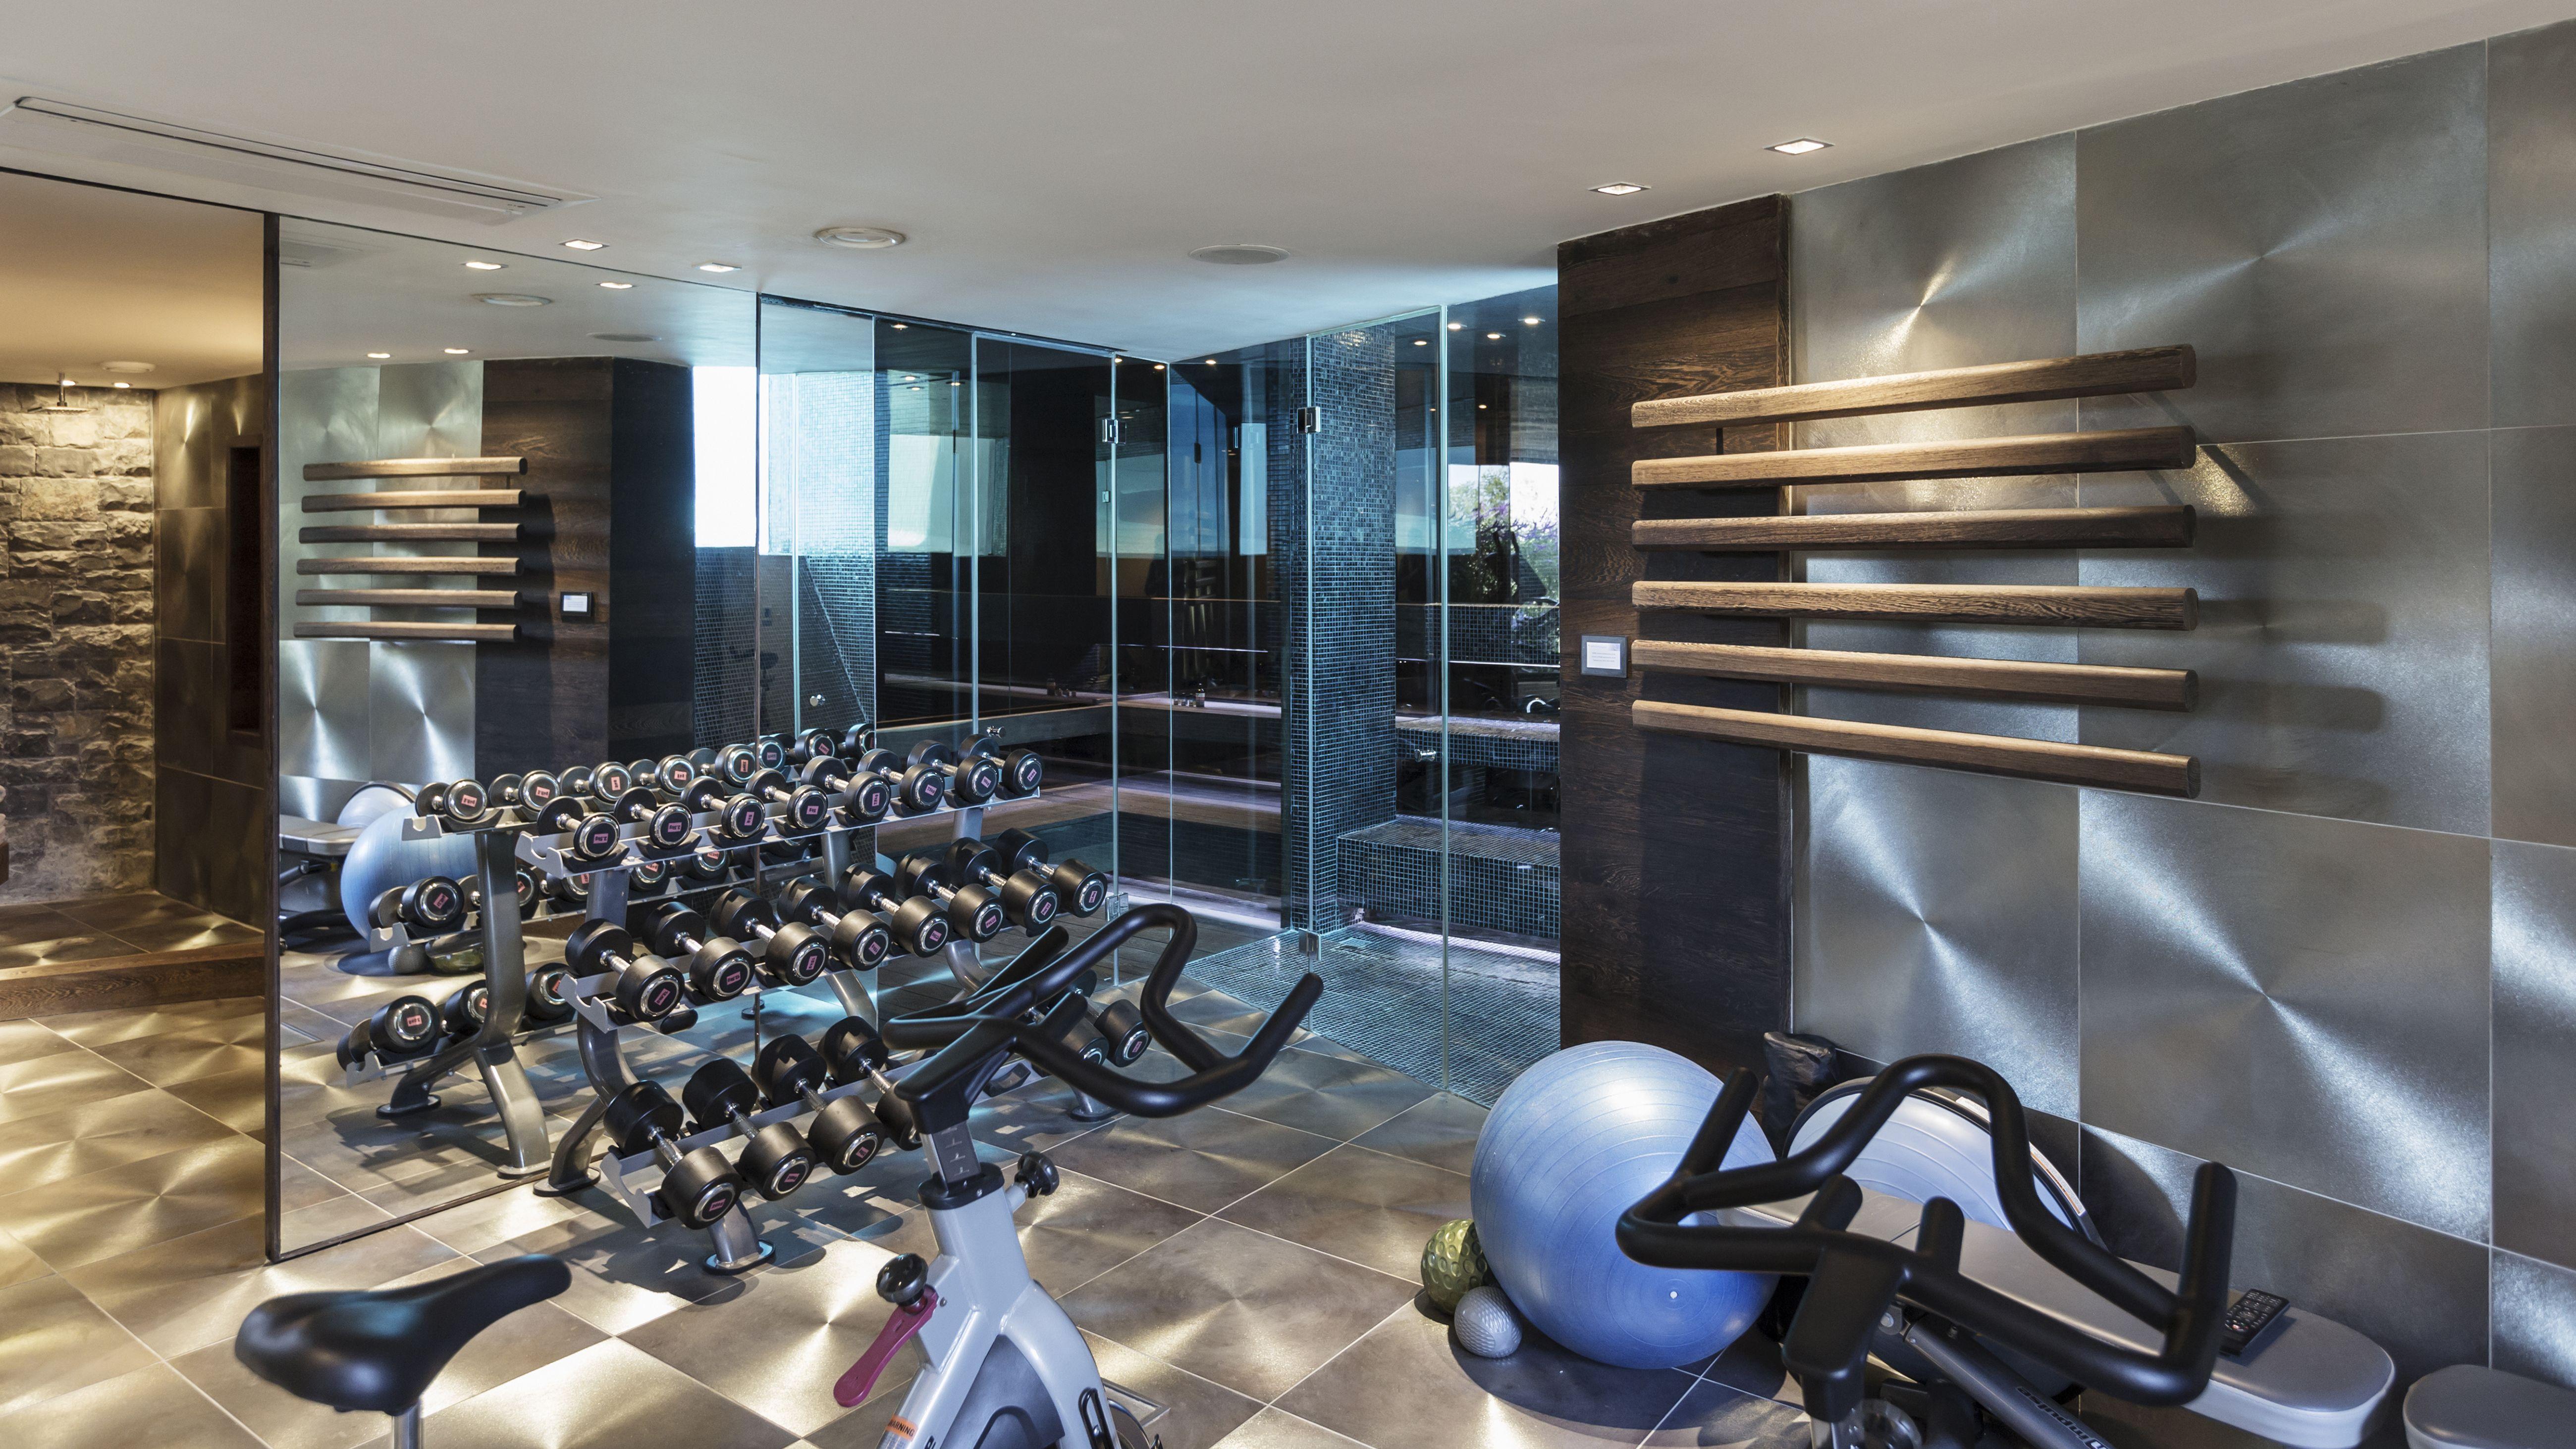 How To Build A Home Gym Building A Home Gym Home Luxury Homes